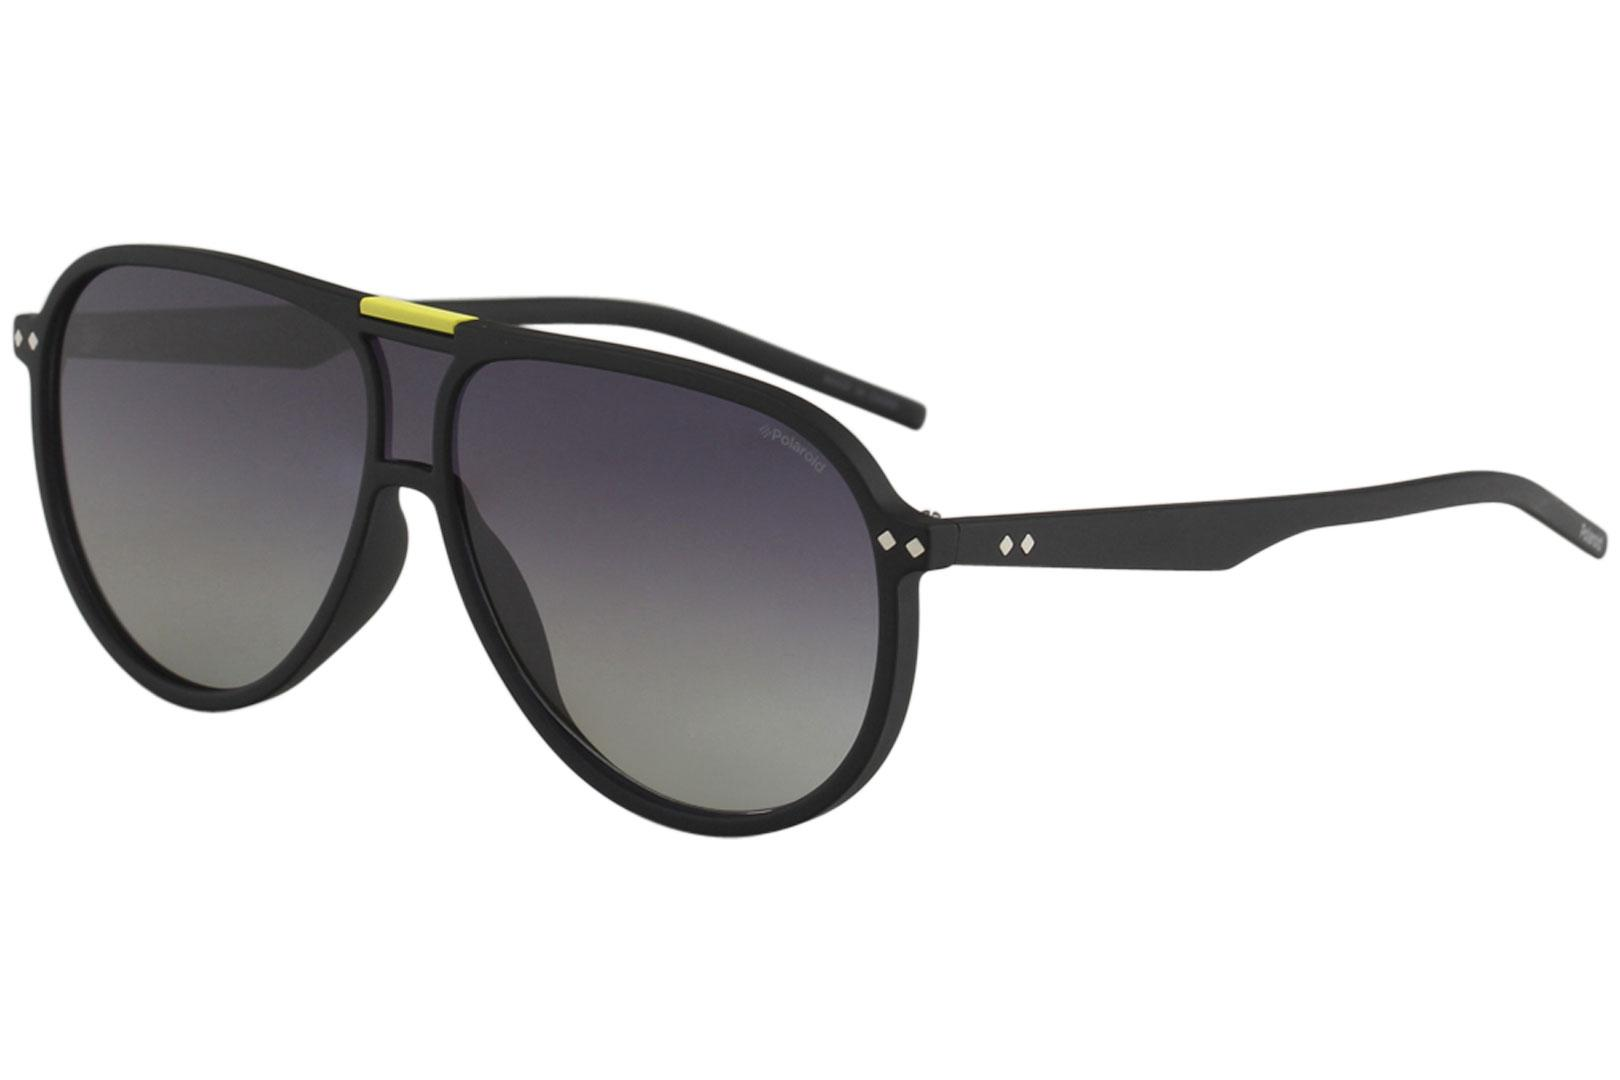 a8b3a8f3251 Polaroid PLD6025S PLD 6025 S Fashion Pilot Shield Polarized Sunglasses by  Polaroid. Touch to zoom